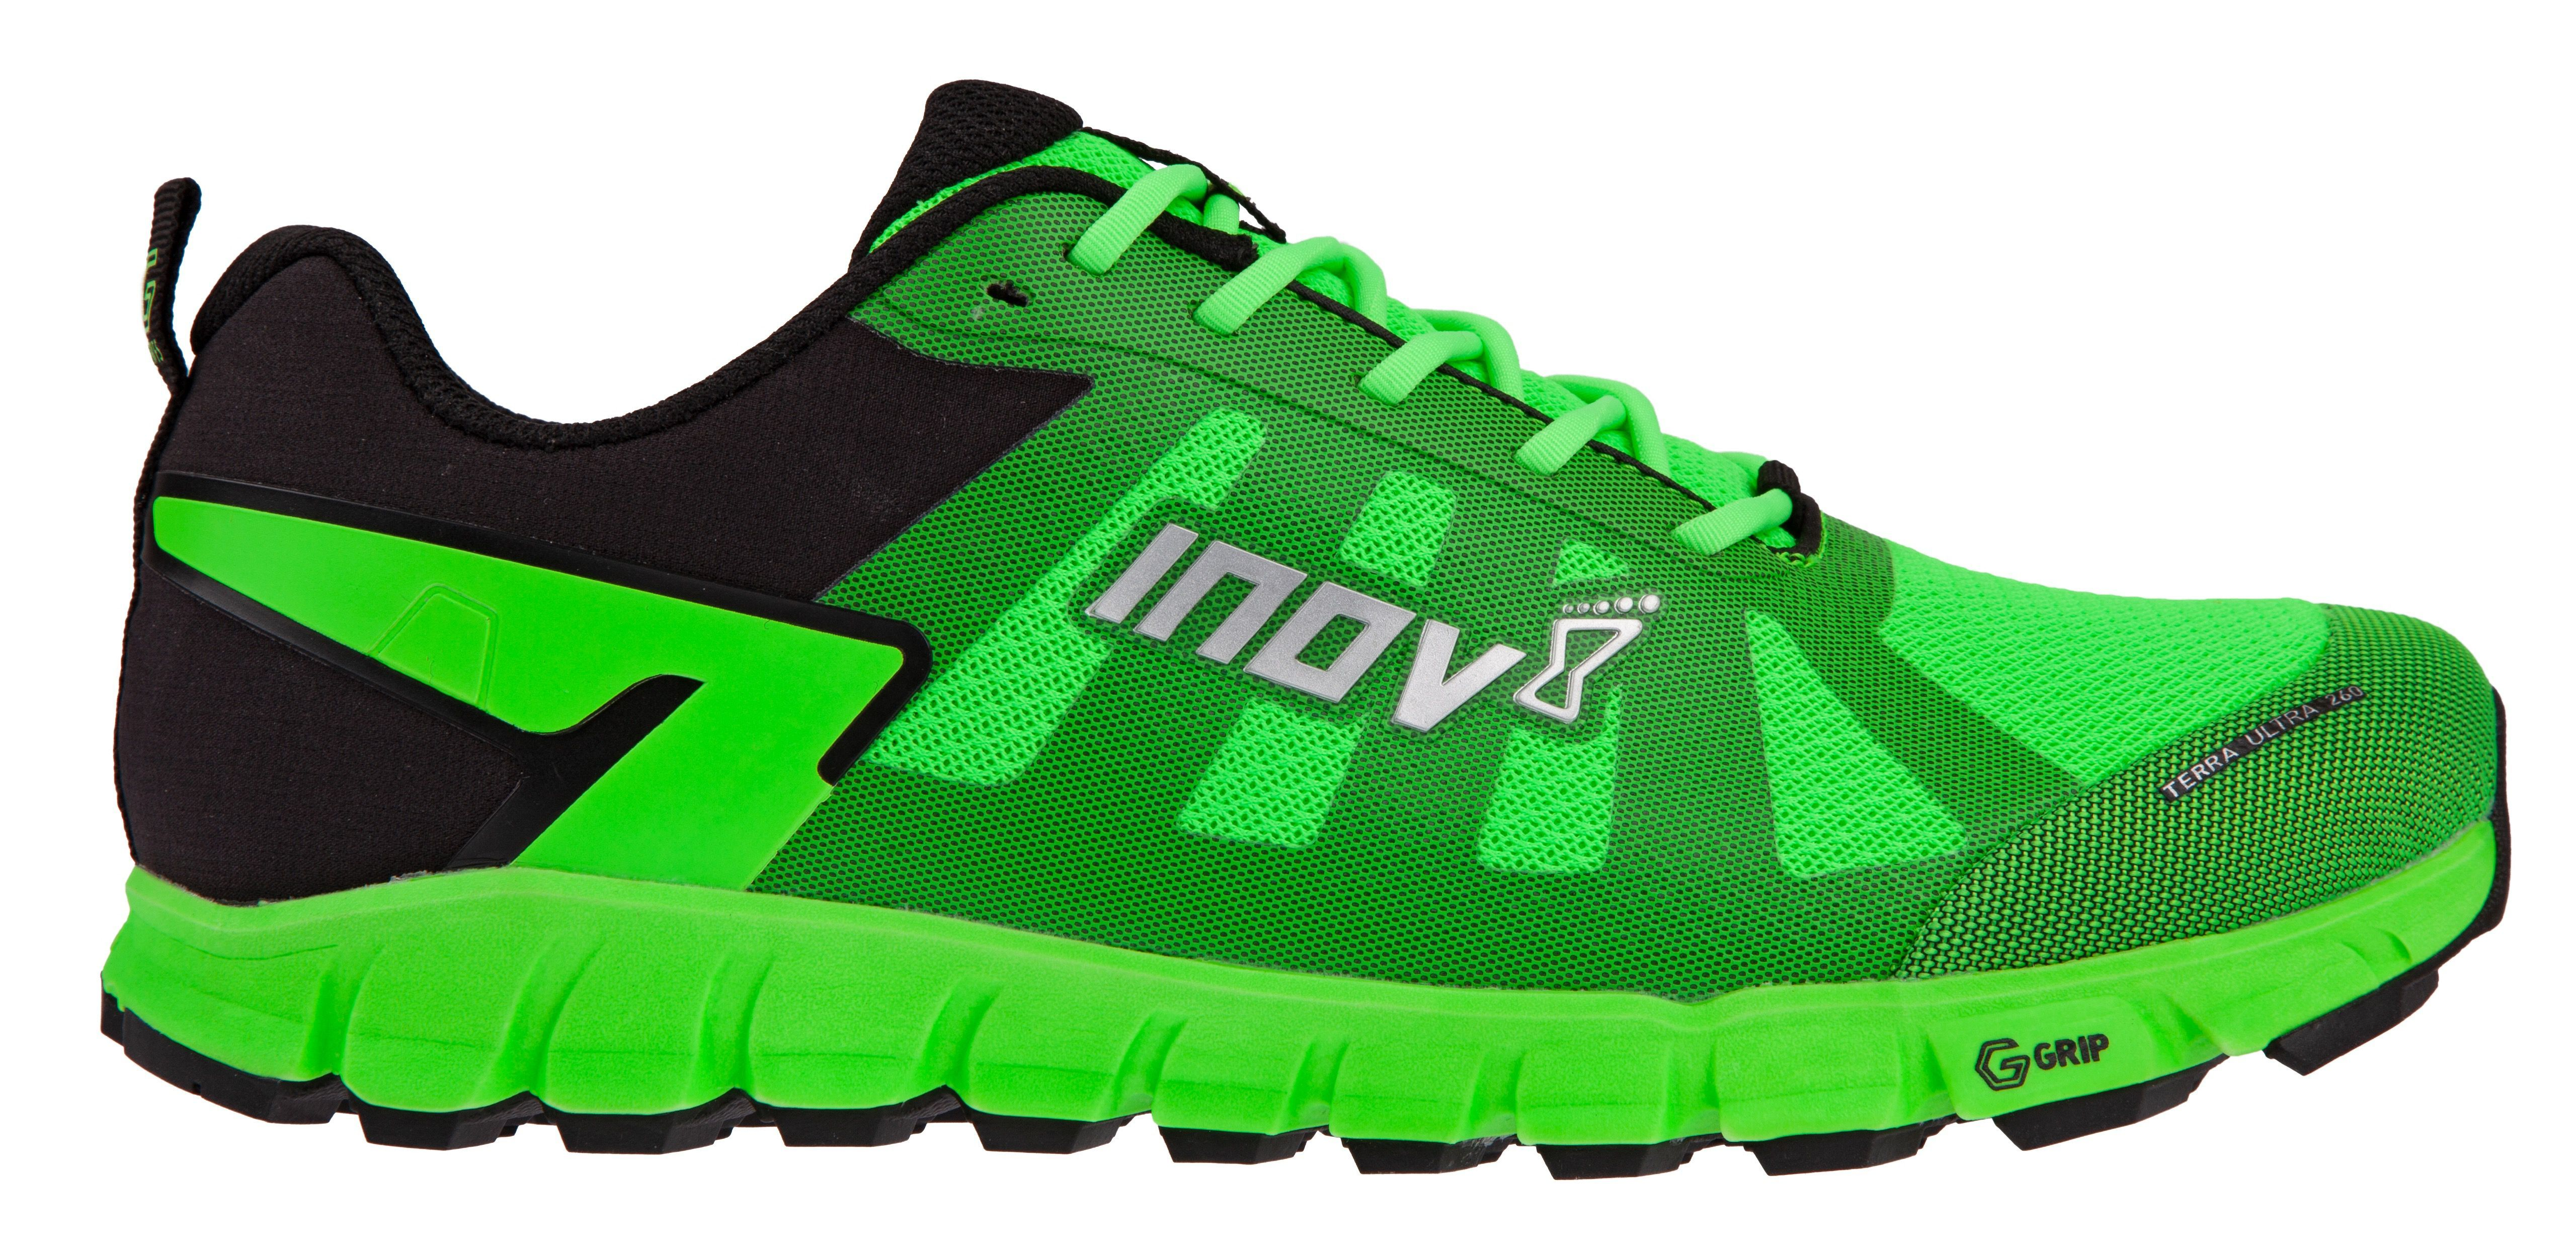 Inov8 Terraultra 260 Womens Chaussure Course Trial AW19